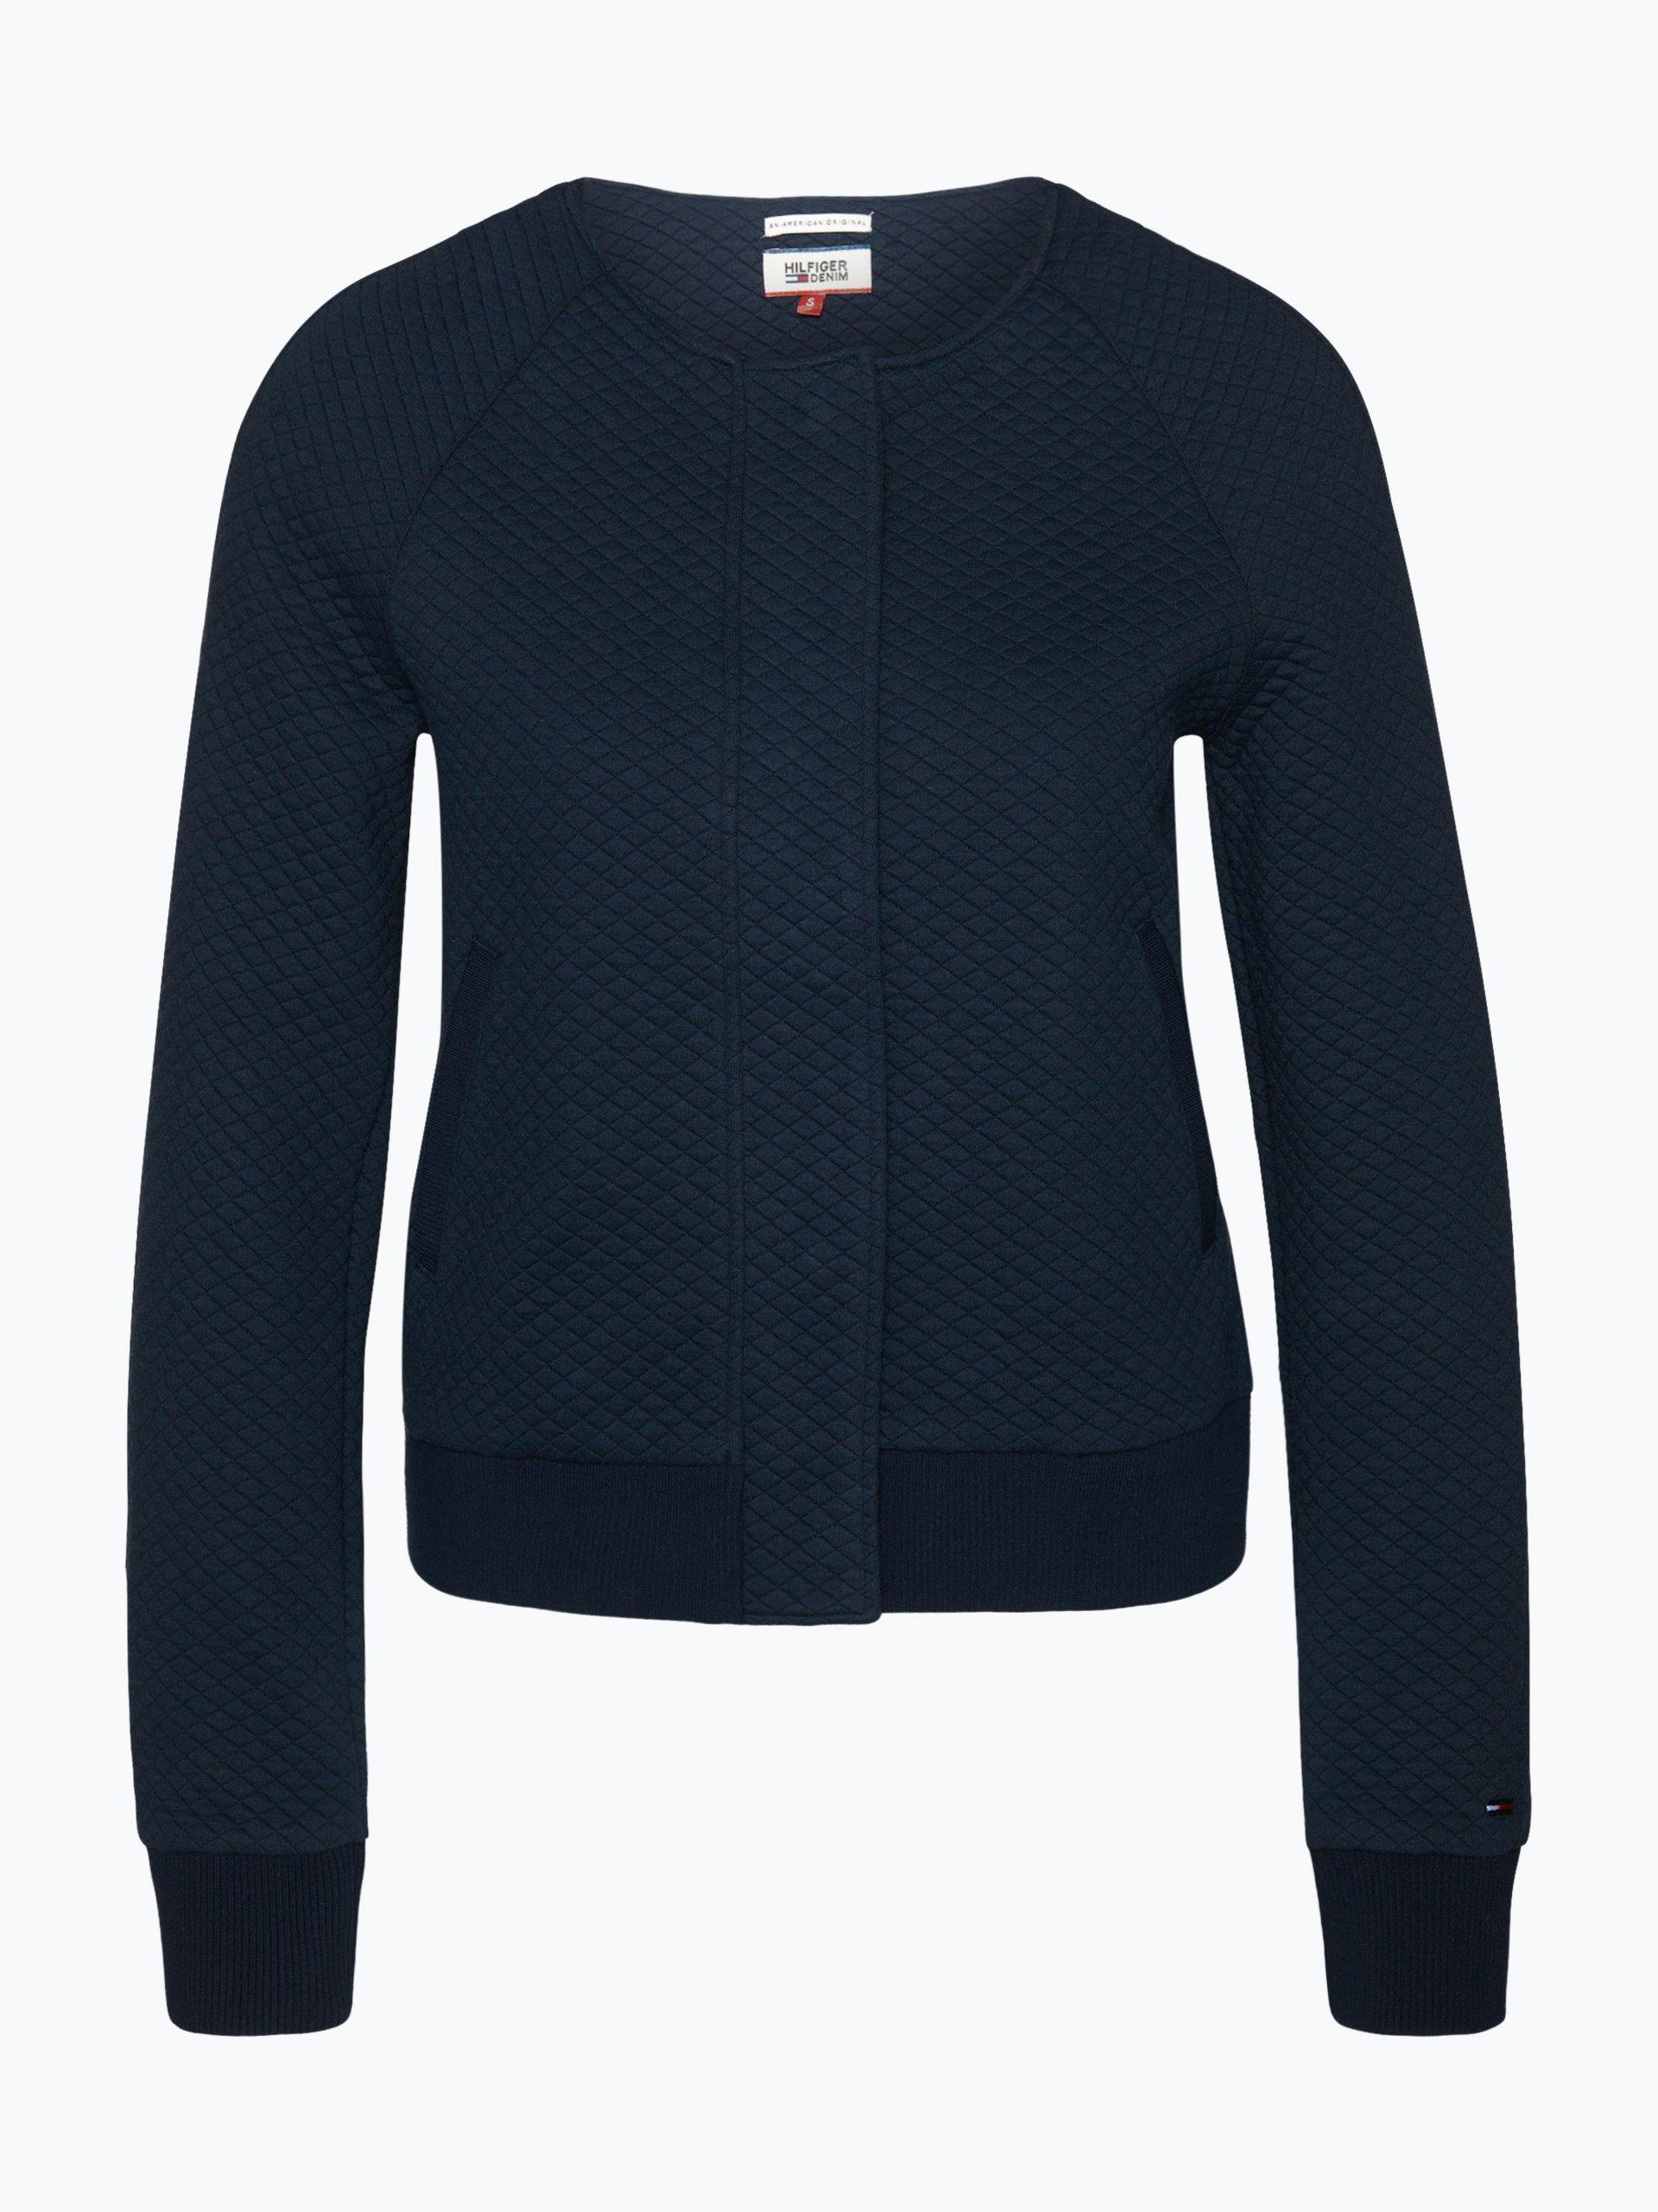 tommy jeans damen sweatjacke marine uni online kaufen. Black Bedroom Furniture Sets. Home Design Ideas